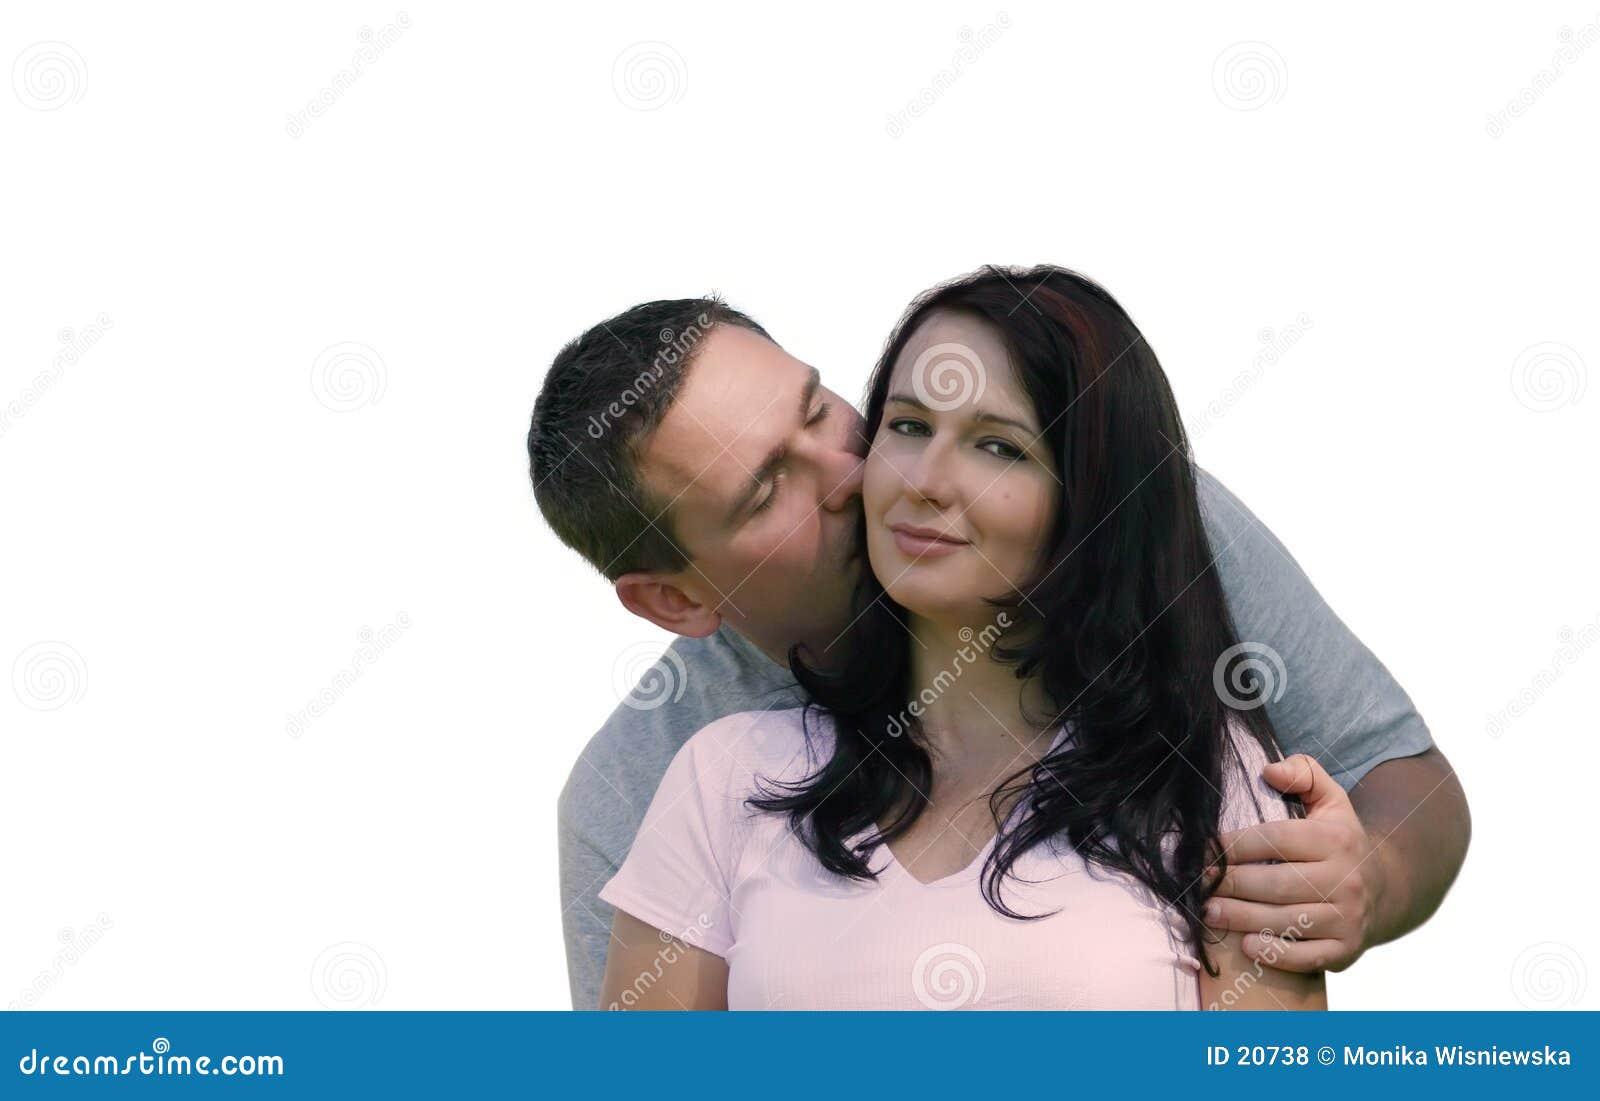 Mensen - Zoete kus